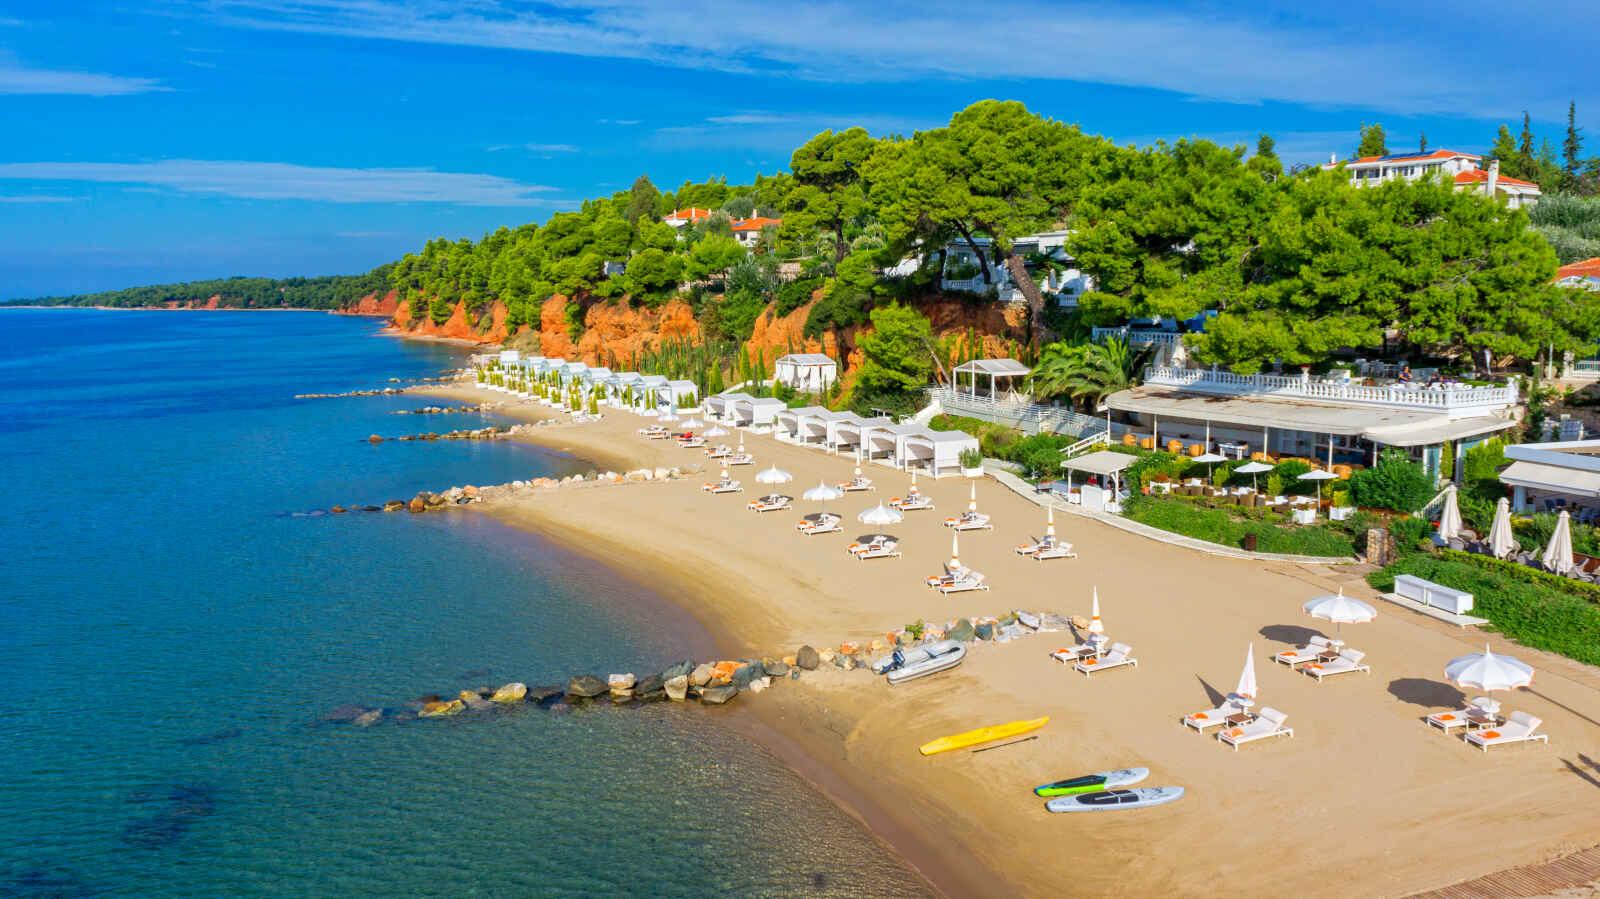 Séjour Grèce - Danaï Beach Resort & Villas - 5*